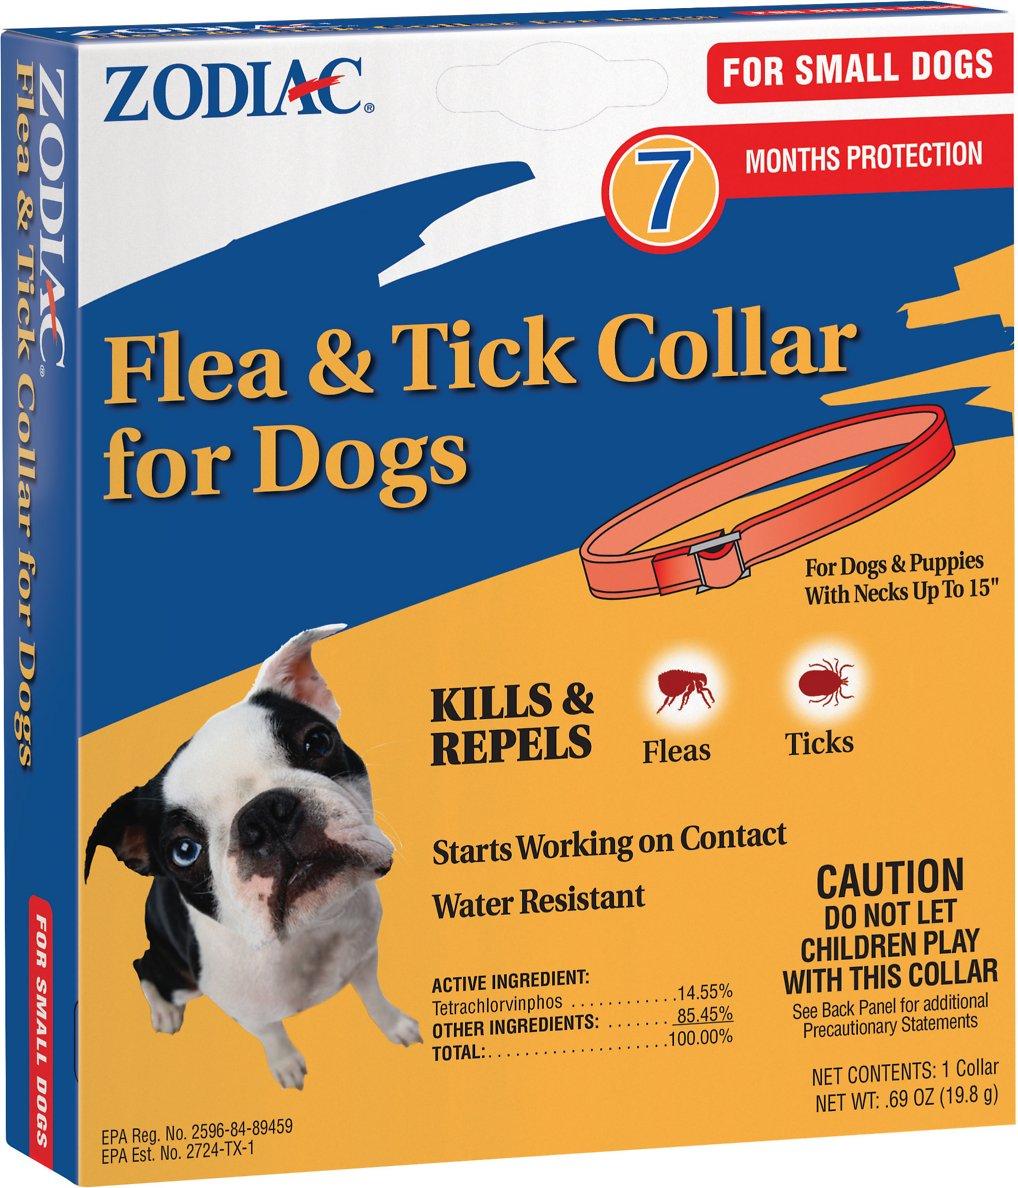 Zodiac Flea & Tick Collar for Small Dogs, 15-in (Size: 15-in) Image